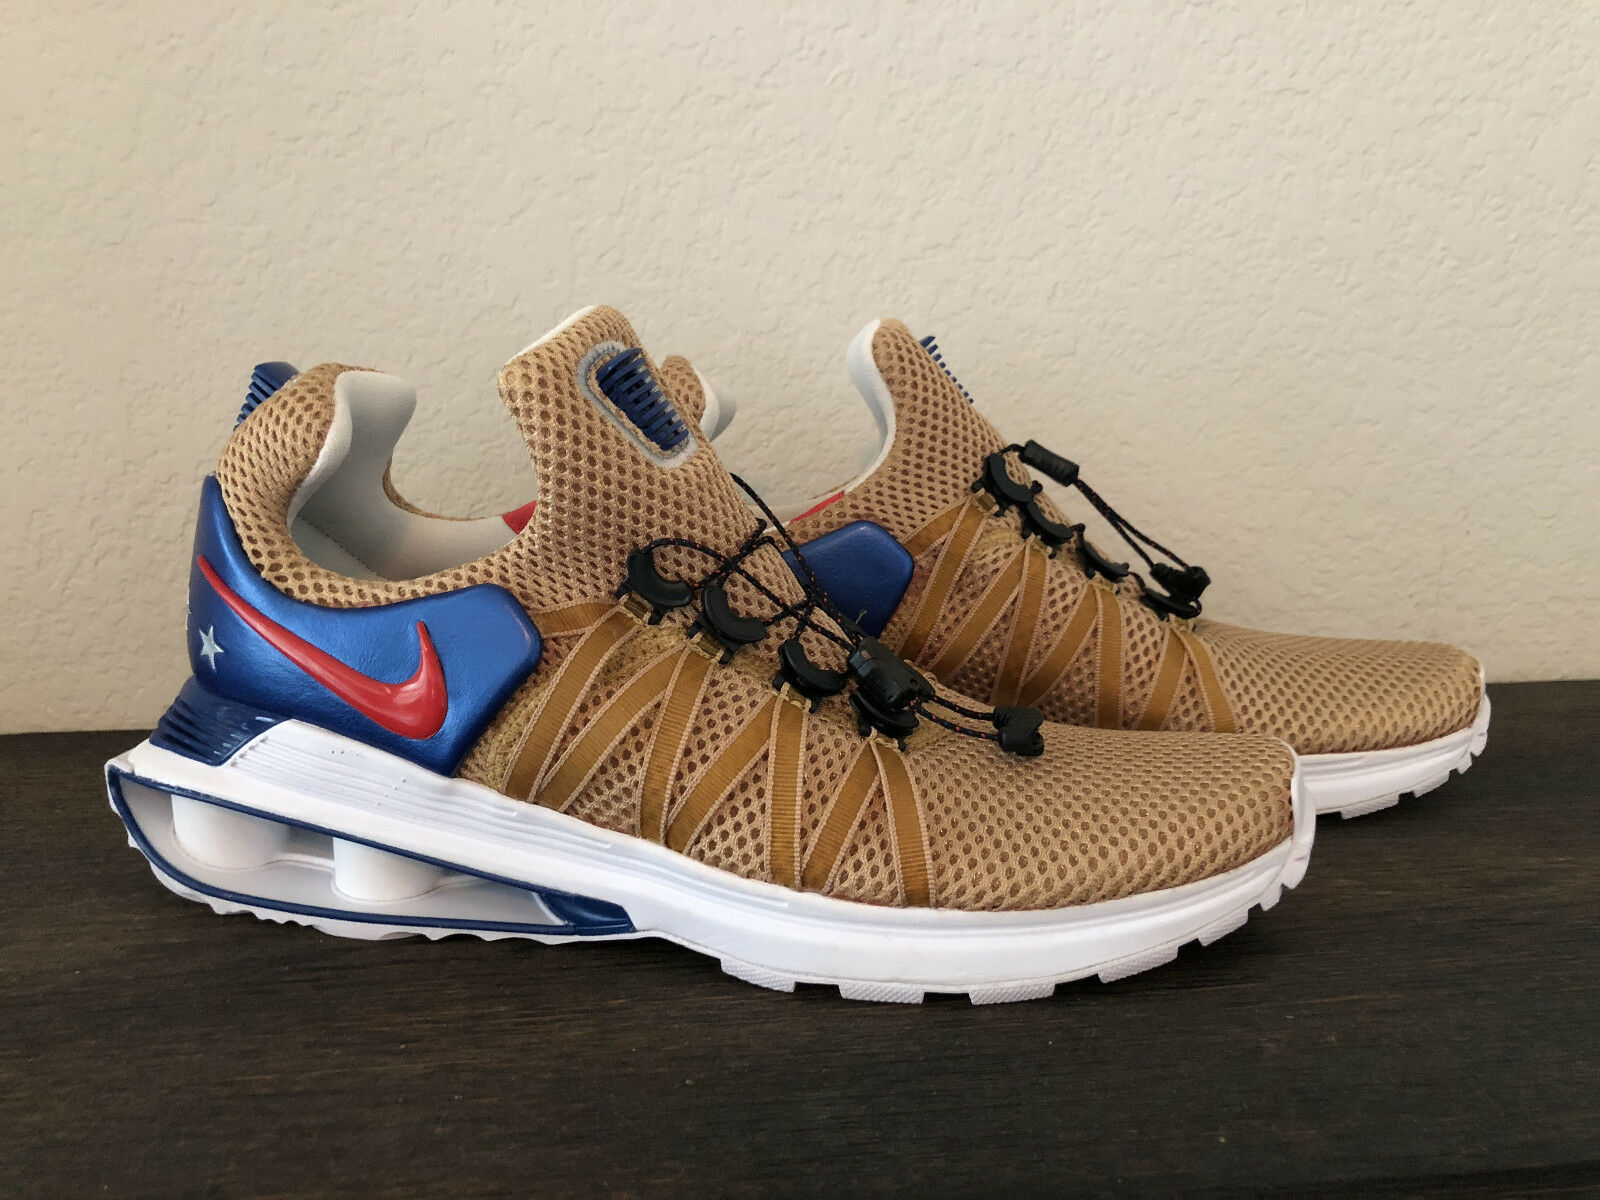 Men's Brand New Nike Shox Gravity Metallic gold Sneakers [AR1999 700] SZ 9.5